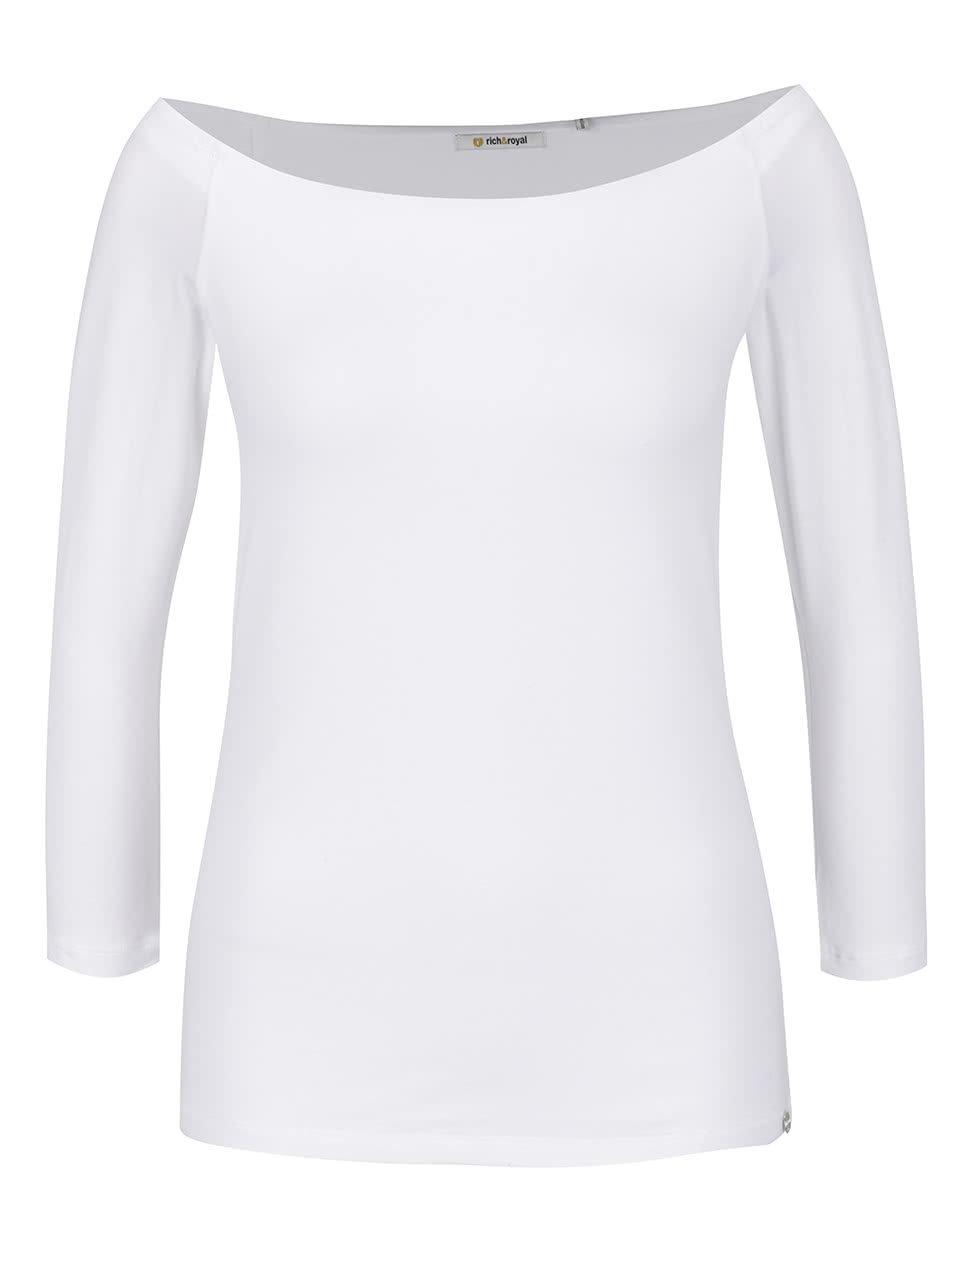 7a4d21de4a9e Biele tričko s lodičkovým výstrihom Rich   Royal ...